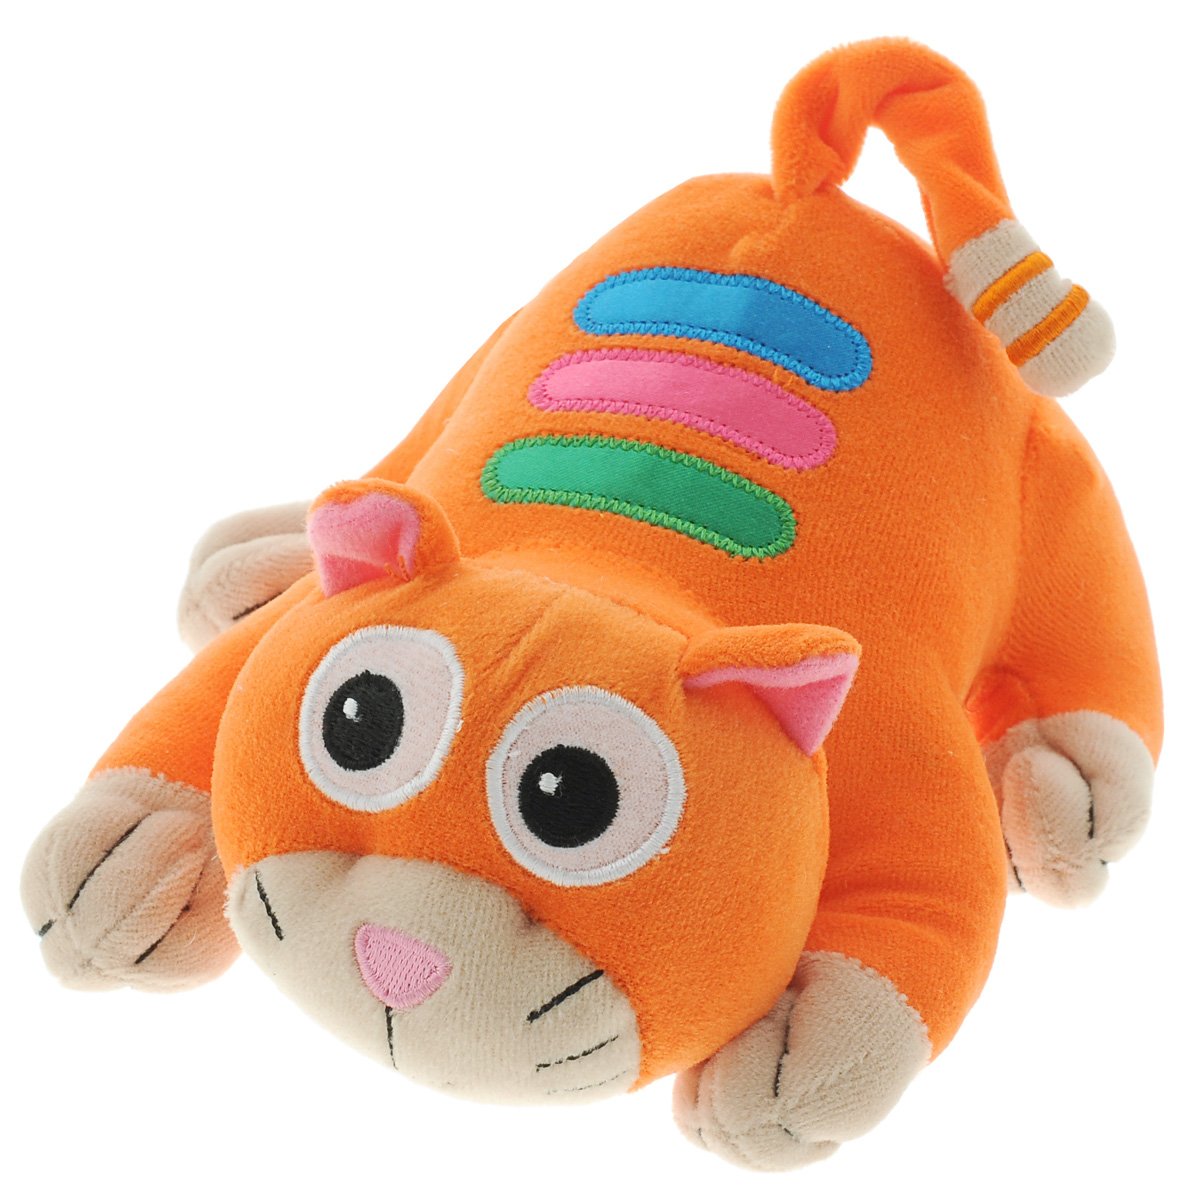 Развивающая игрушка Learning Journey Убегающий котенок learning journey